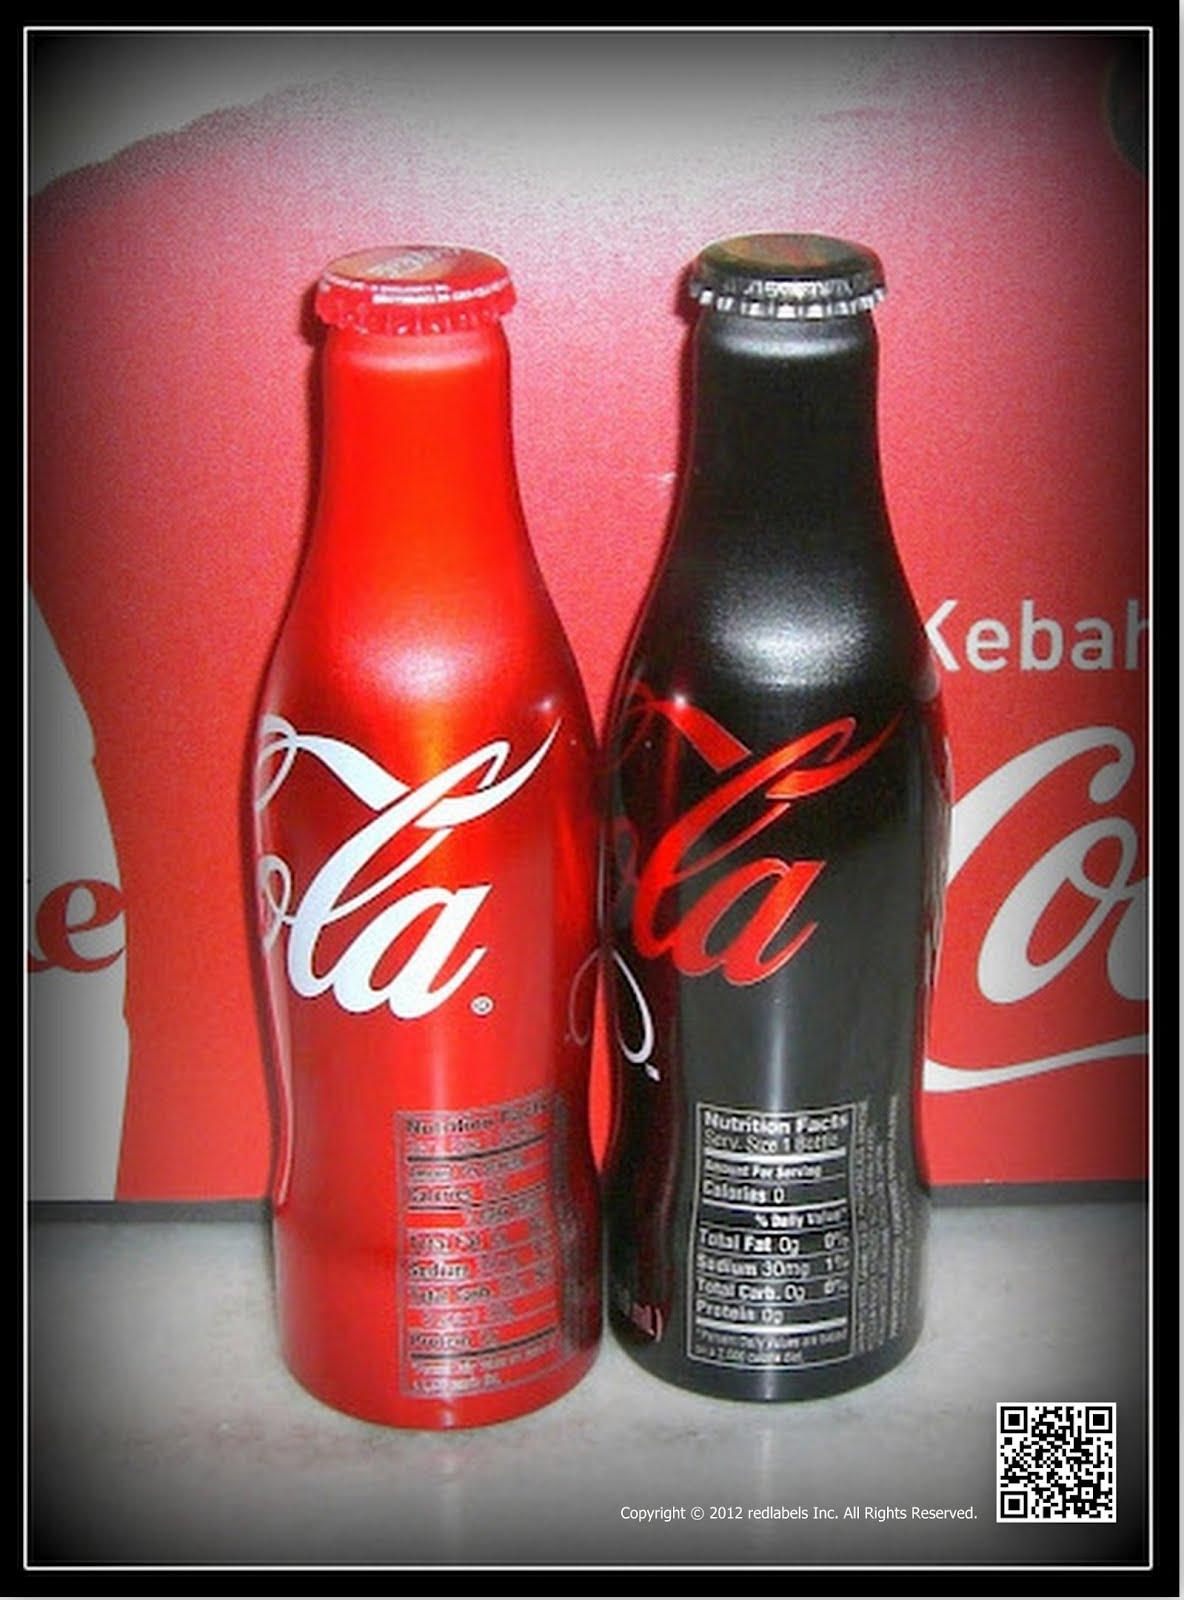 aluminum bottle collector club coca cola test bottle usa 2008. Black Bedroom Furniture Sets. Home Design Ideas